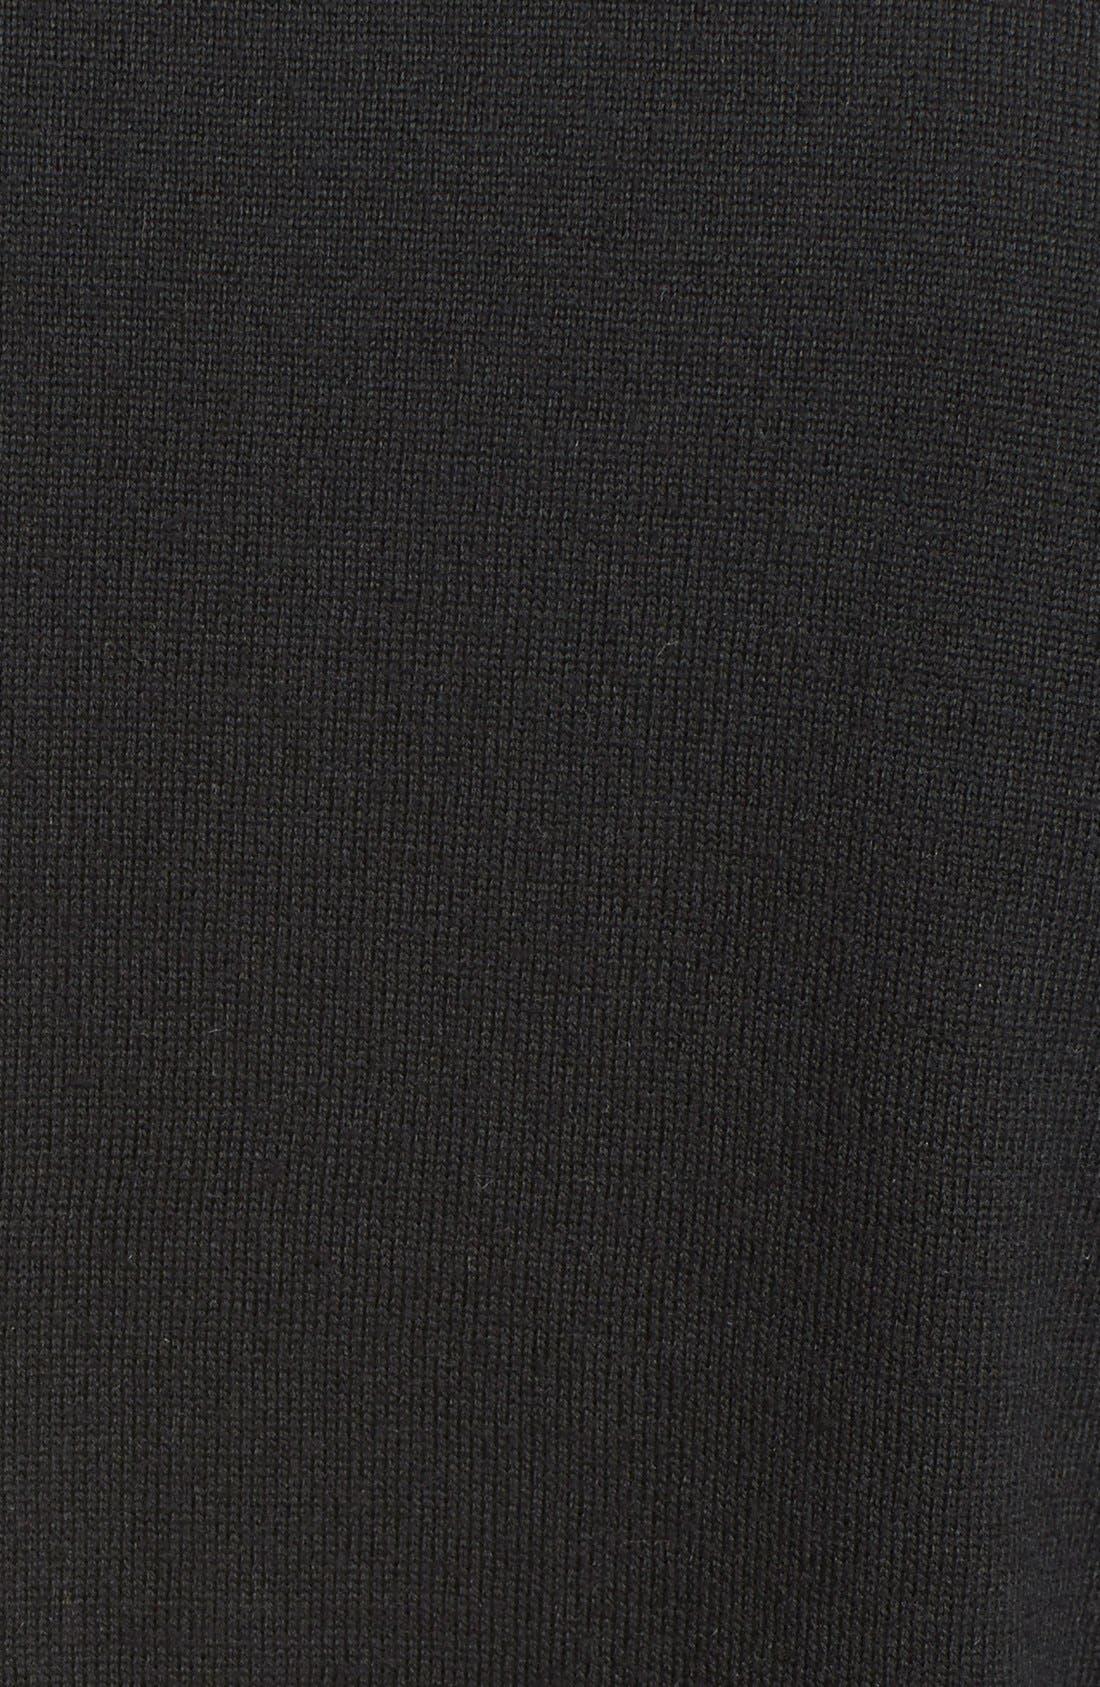 'Kelby' Full Zip Wool Sweater,                             Alternate thumbnail 5, color,                             Black